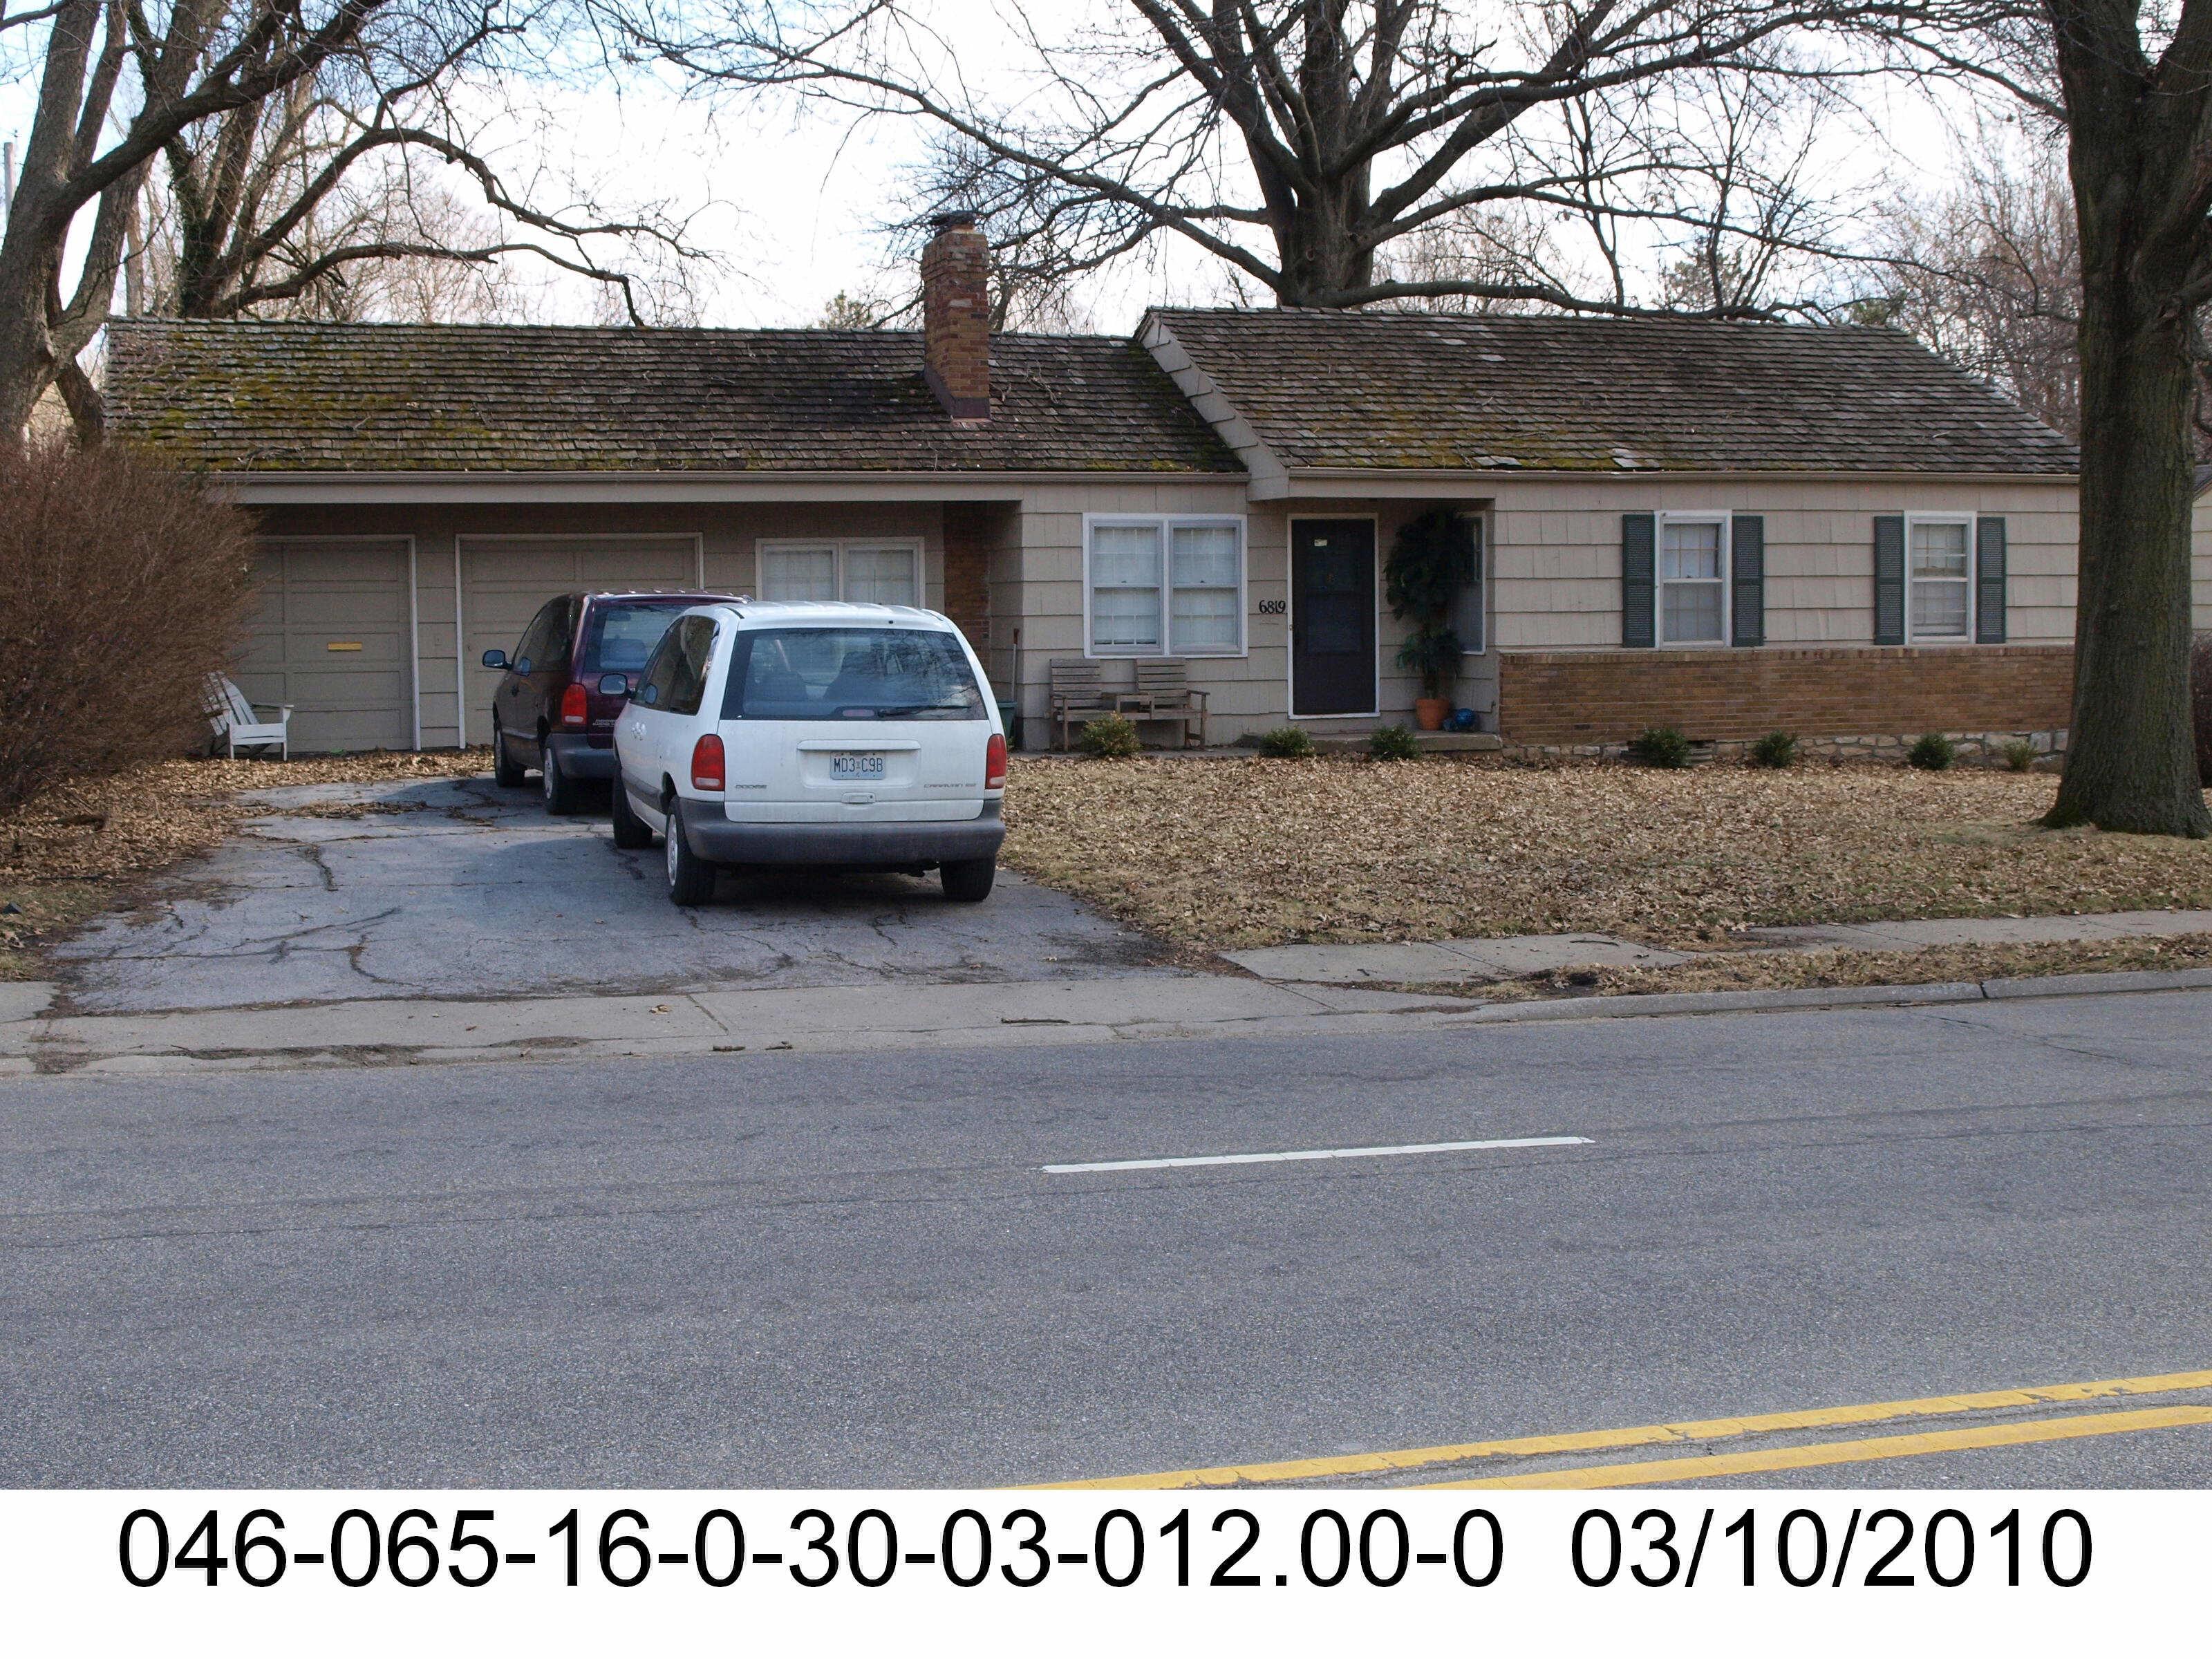 Kansas johnson county prairie village -  84 000 Property In Prairie Village Kansas